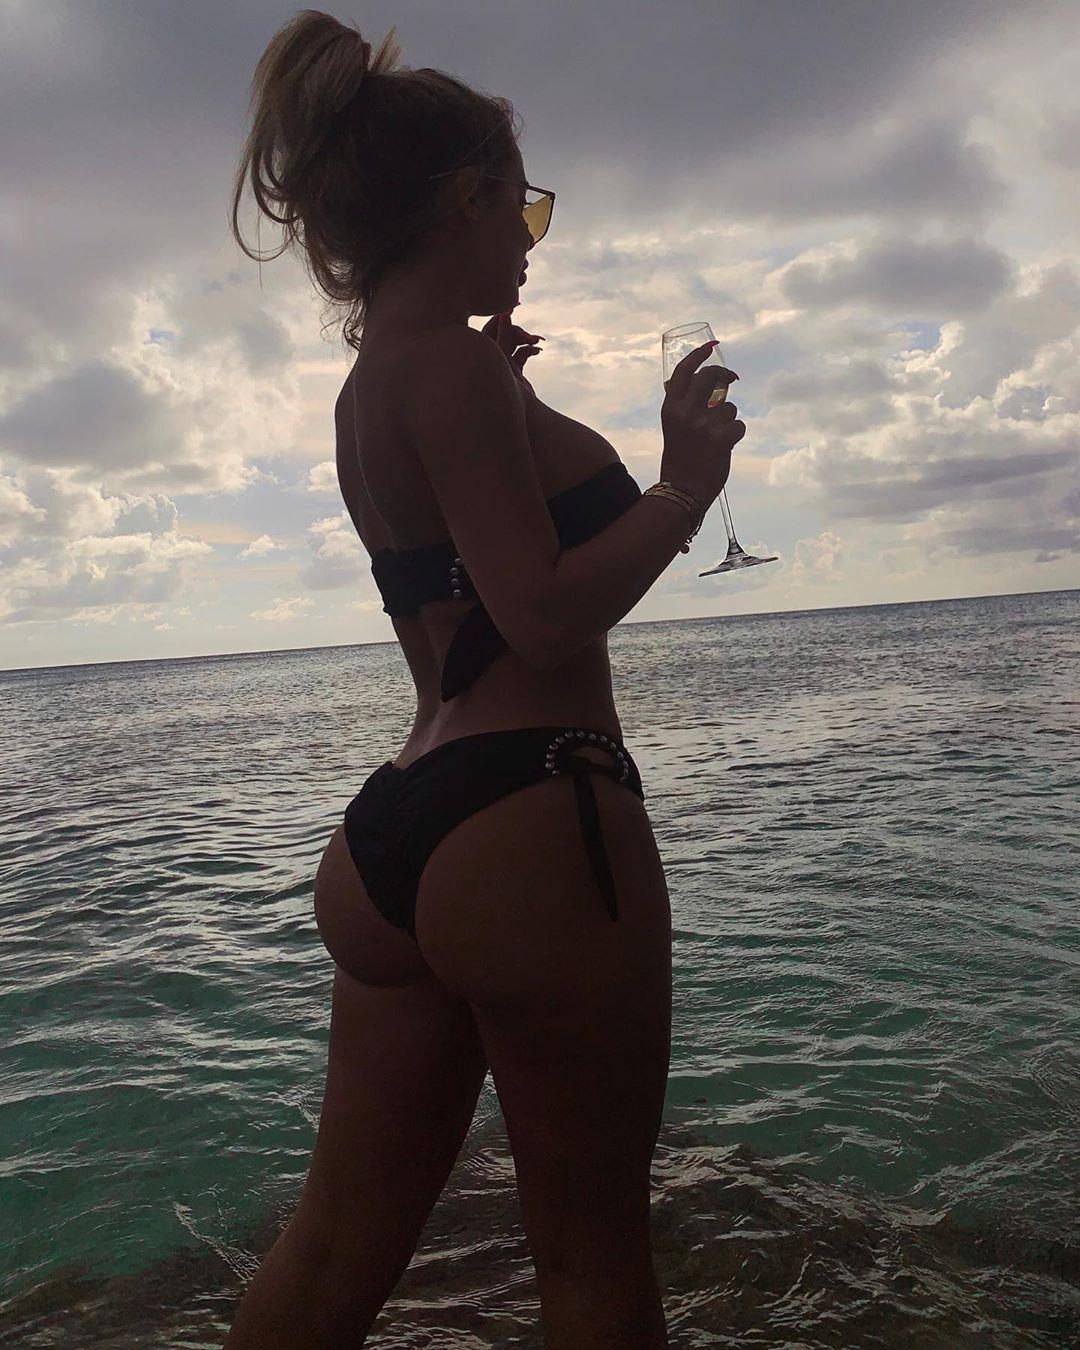 Brielle Biermann Instagram Pictures, Brielle Biermann, Kim Zolciak-Biermann